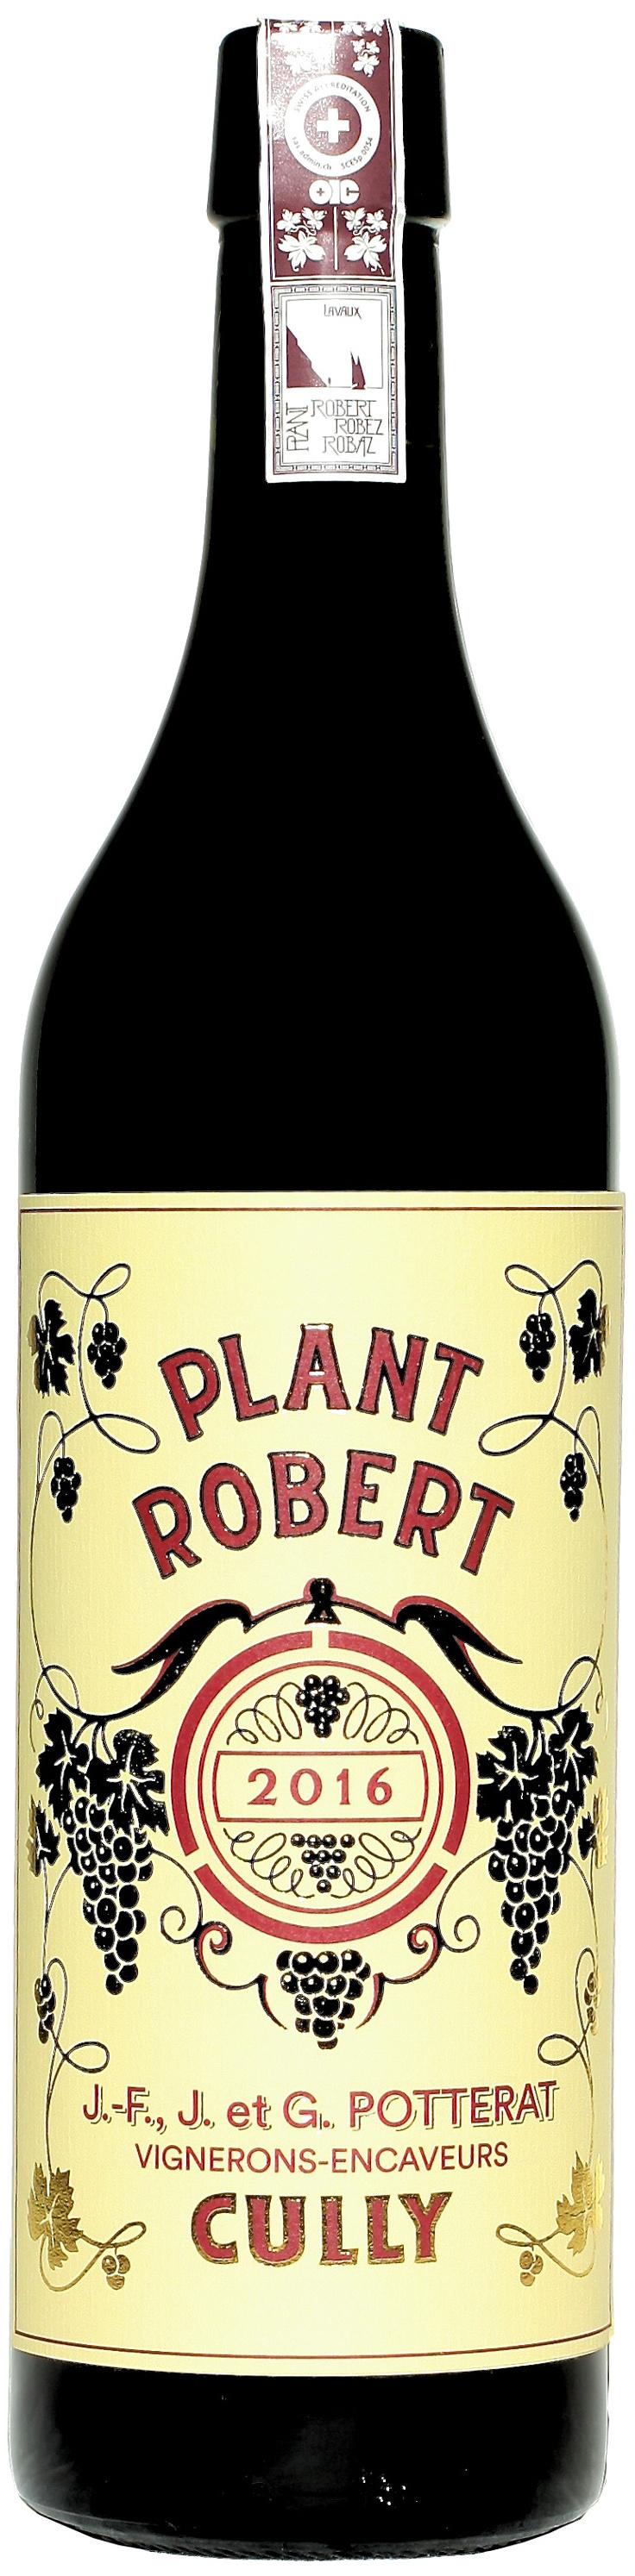 Plant Robert - J.-F., J. et G. Potterat